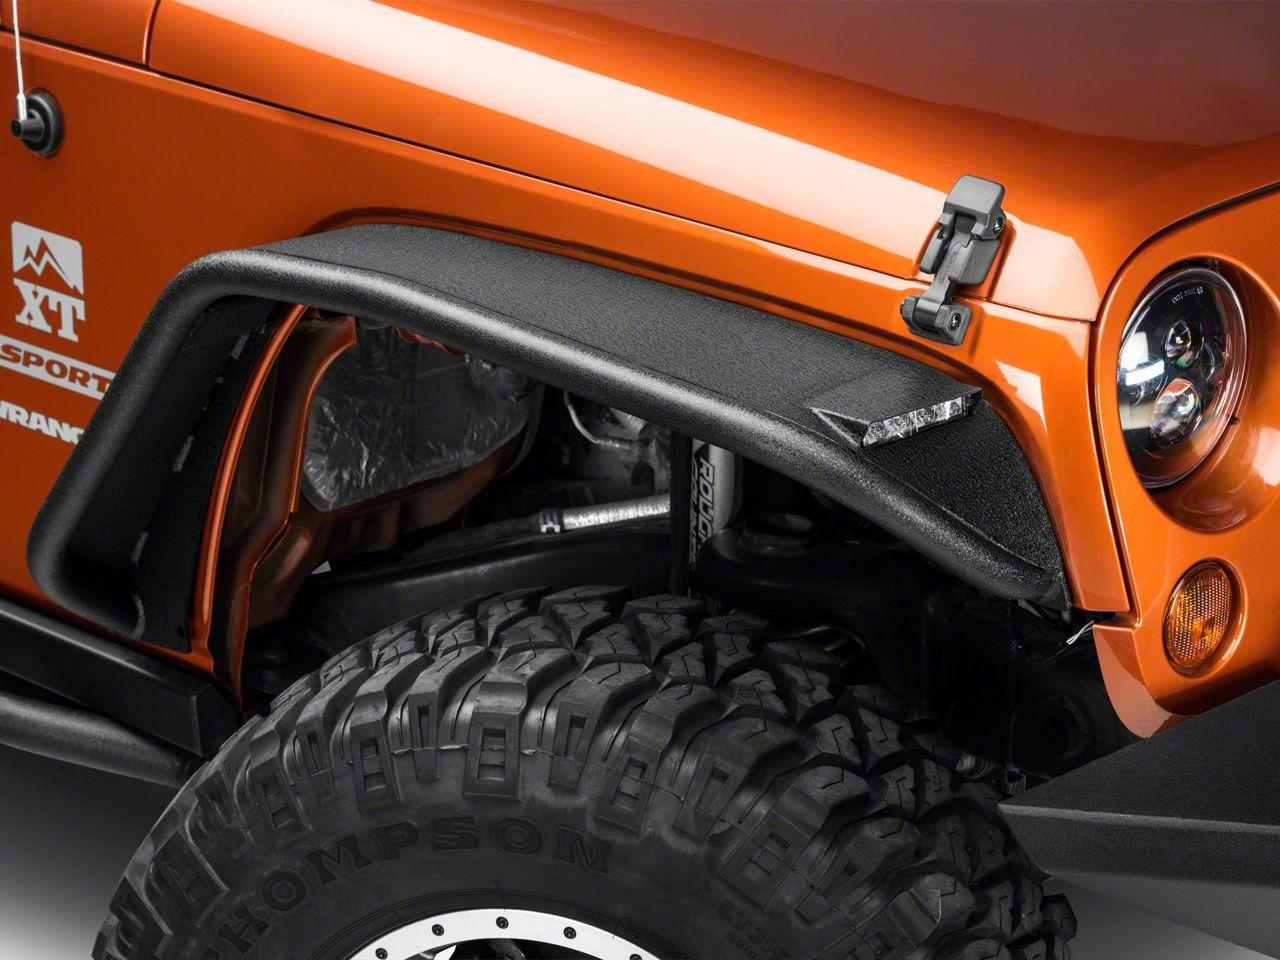 Barricade Front & Rear Tubular Fender Flares (07-18 Jeep Wrangler JK)